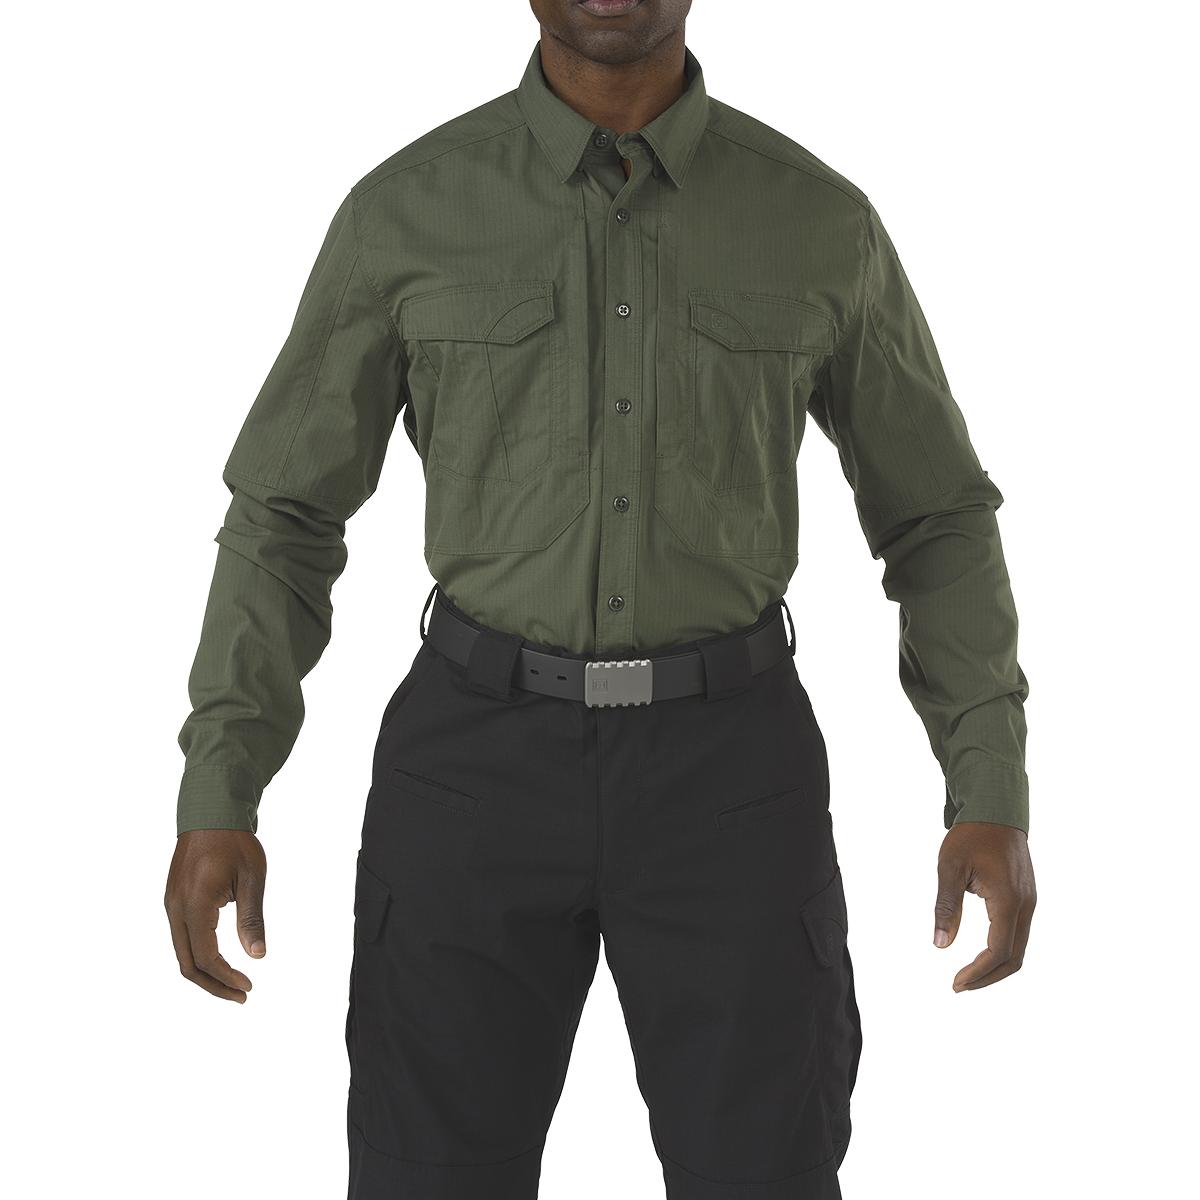 5.11 Tactical Mens Hunting Stryke Shirt Long Sleeve Hiking Ripstop Top Tdu Green